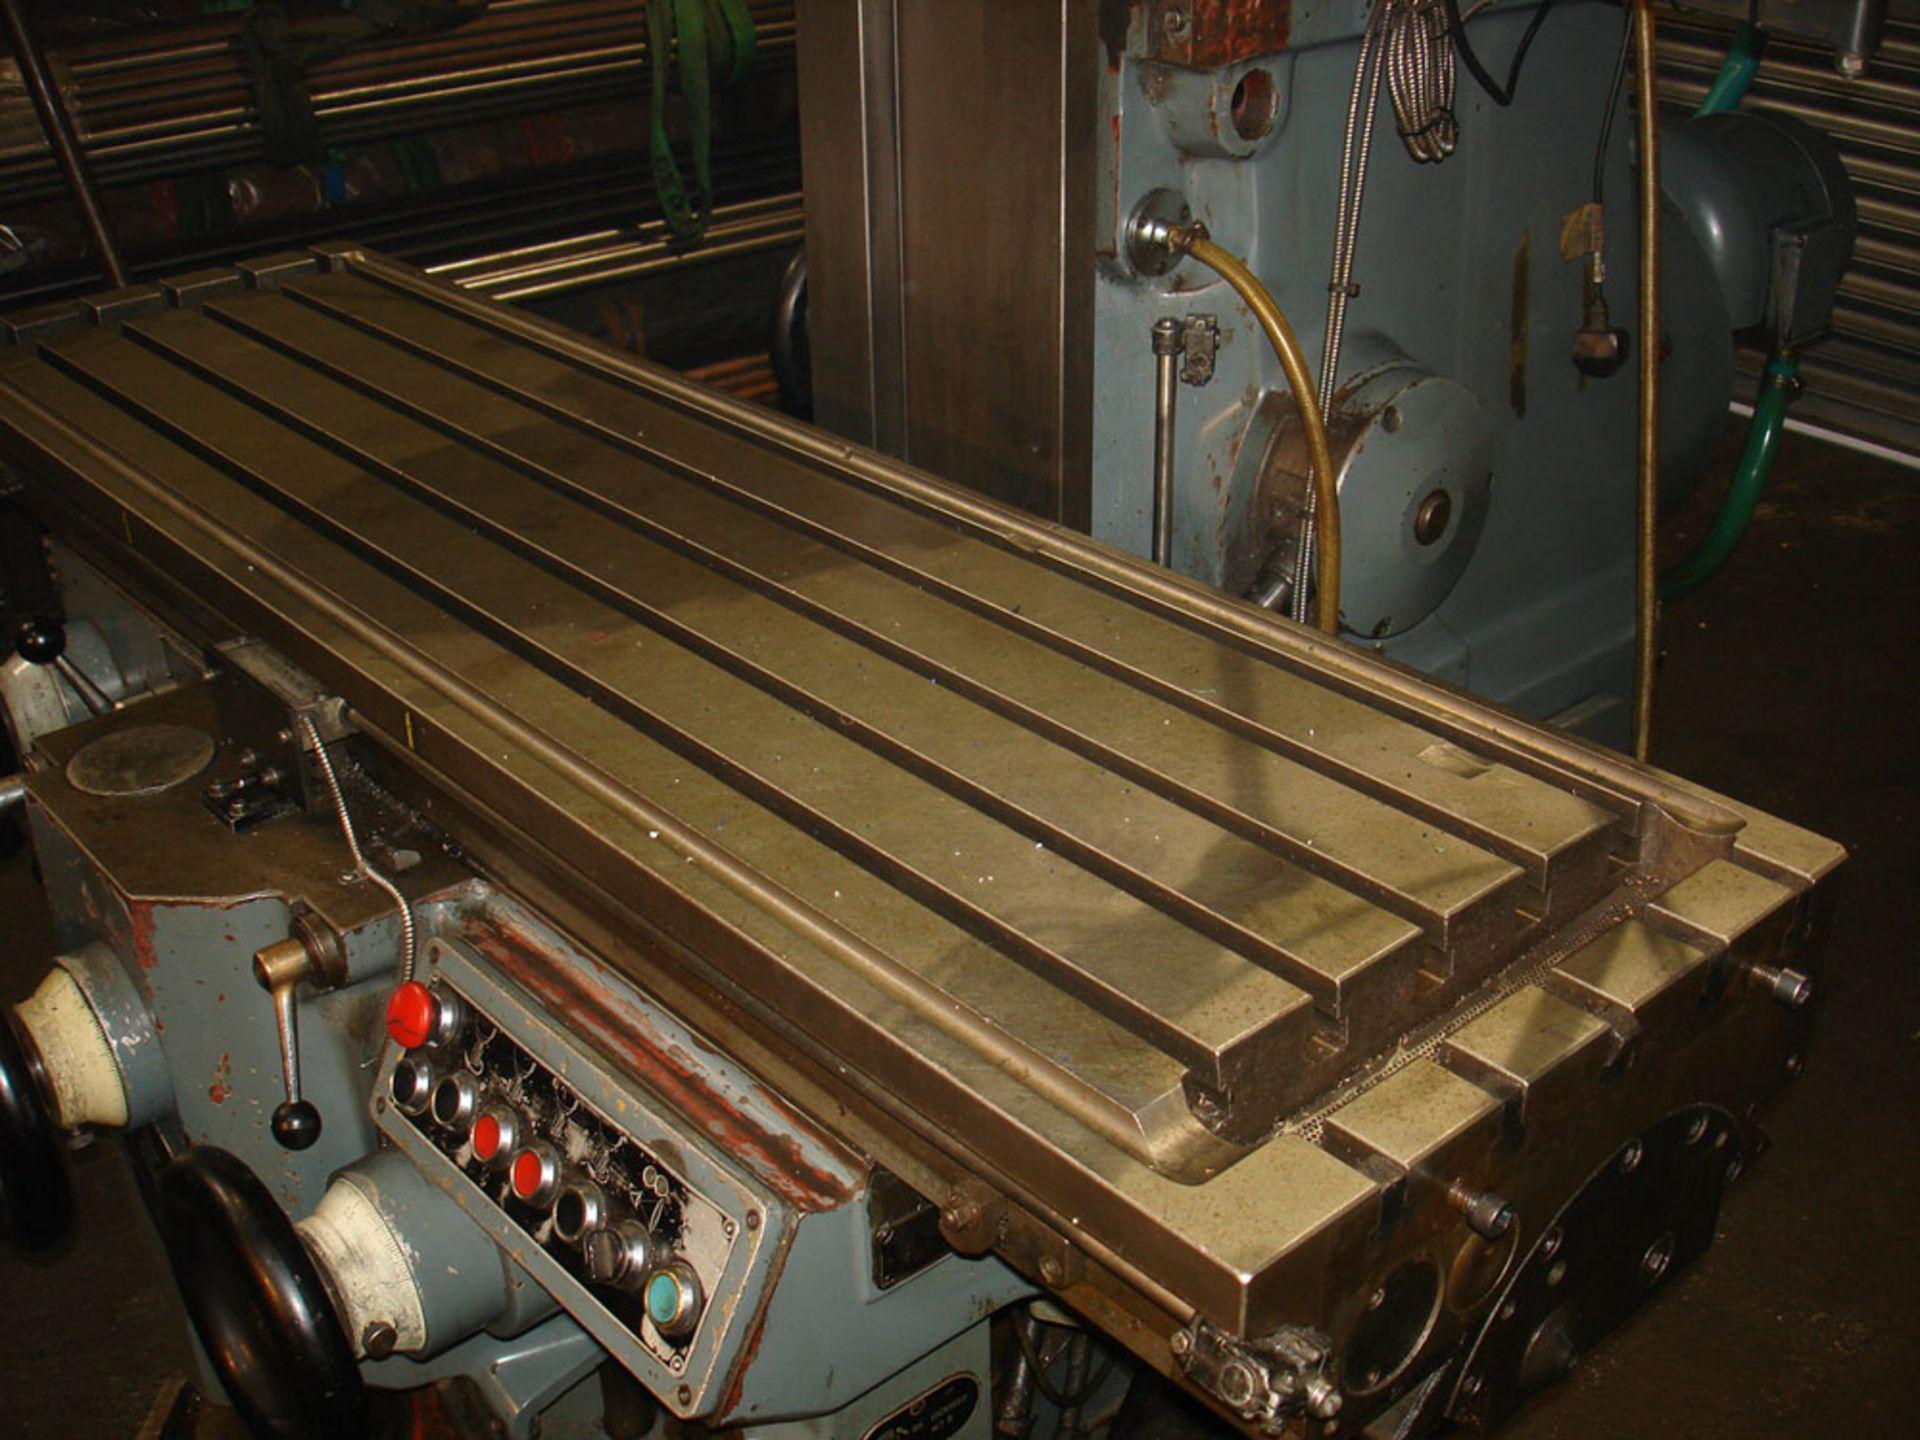 Huron NU5 Universal Milling Machine. Universal Head. Table 1600 x 460 mm. - Image 3 of 7